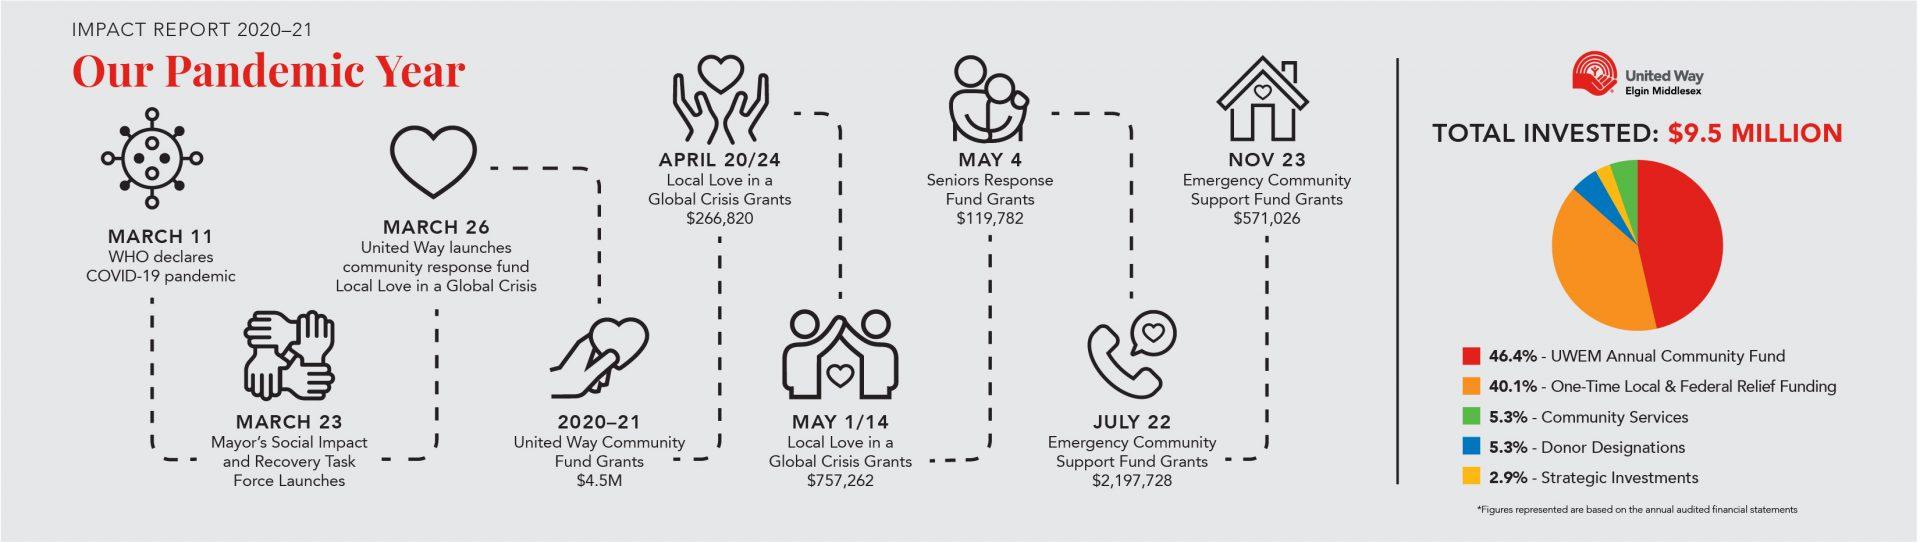 2021 Impact report timeline